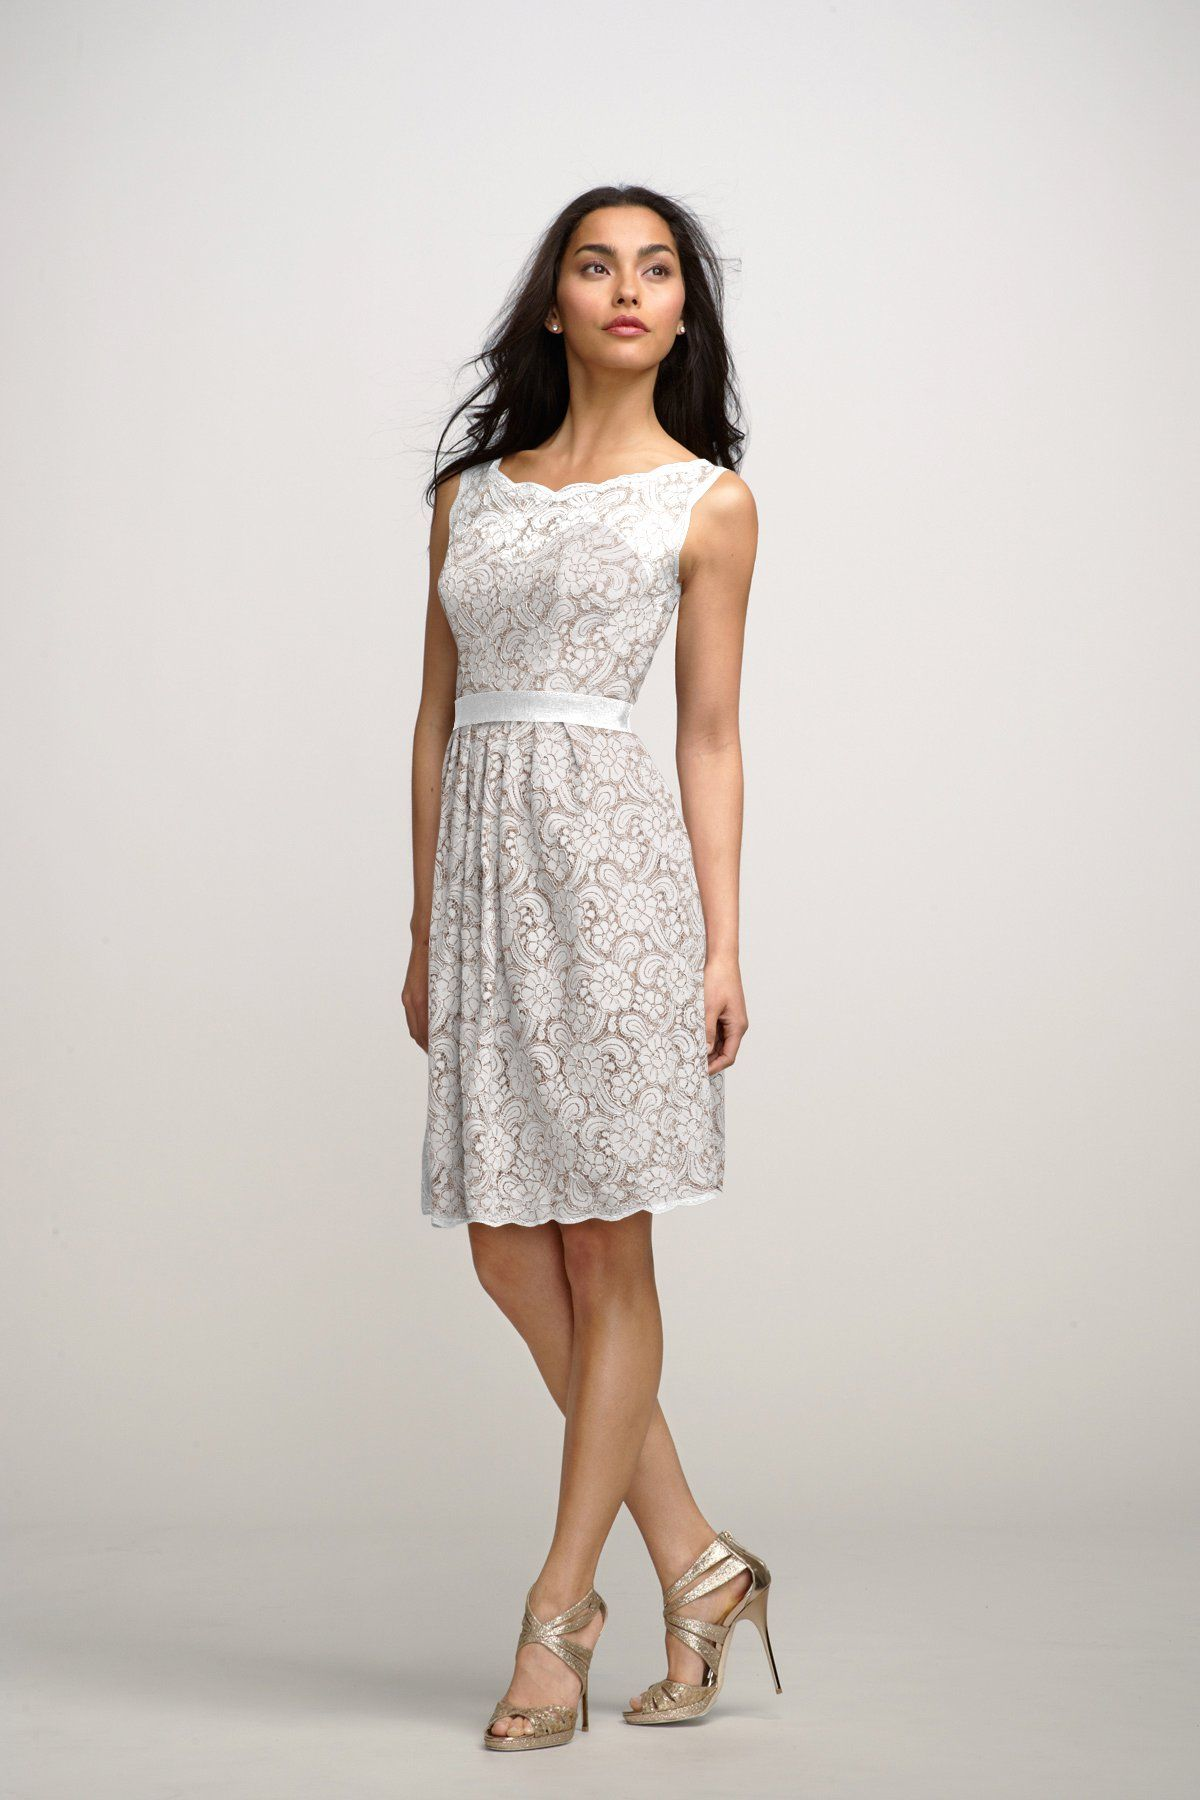 Peach dress for wedding guest  Encore Dress Camellia  wedding  Pinterest  Camellia and Wedding